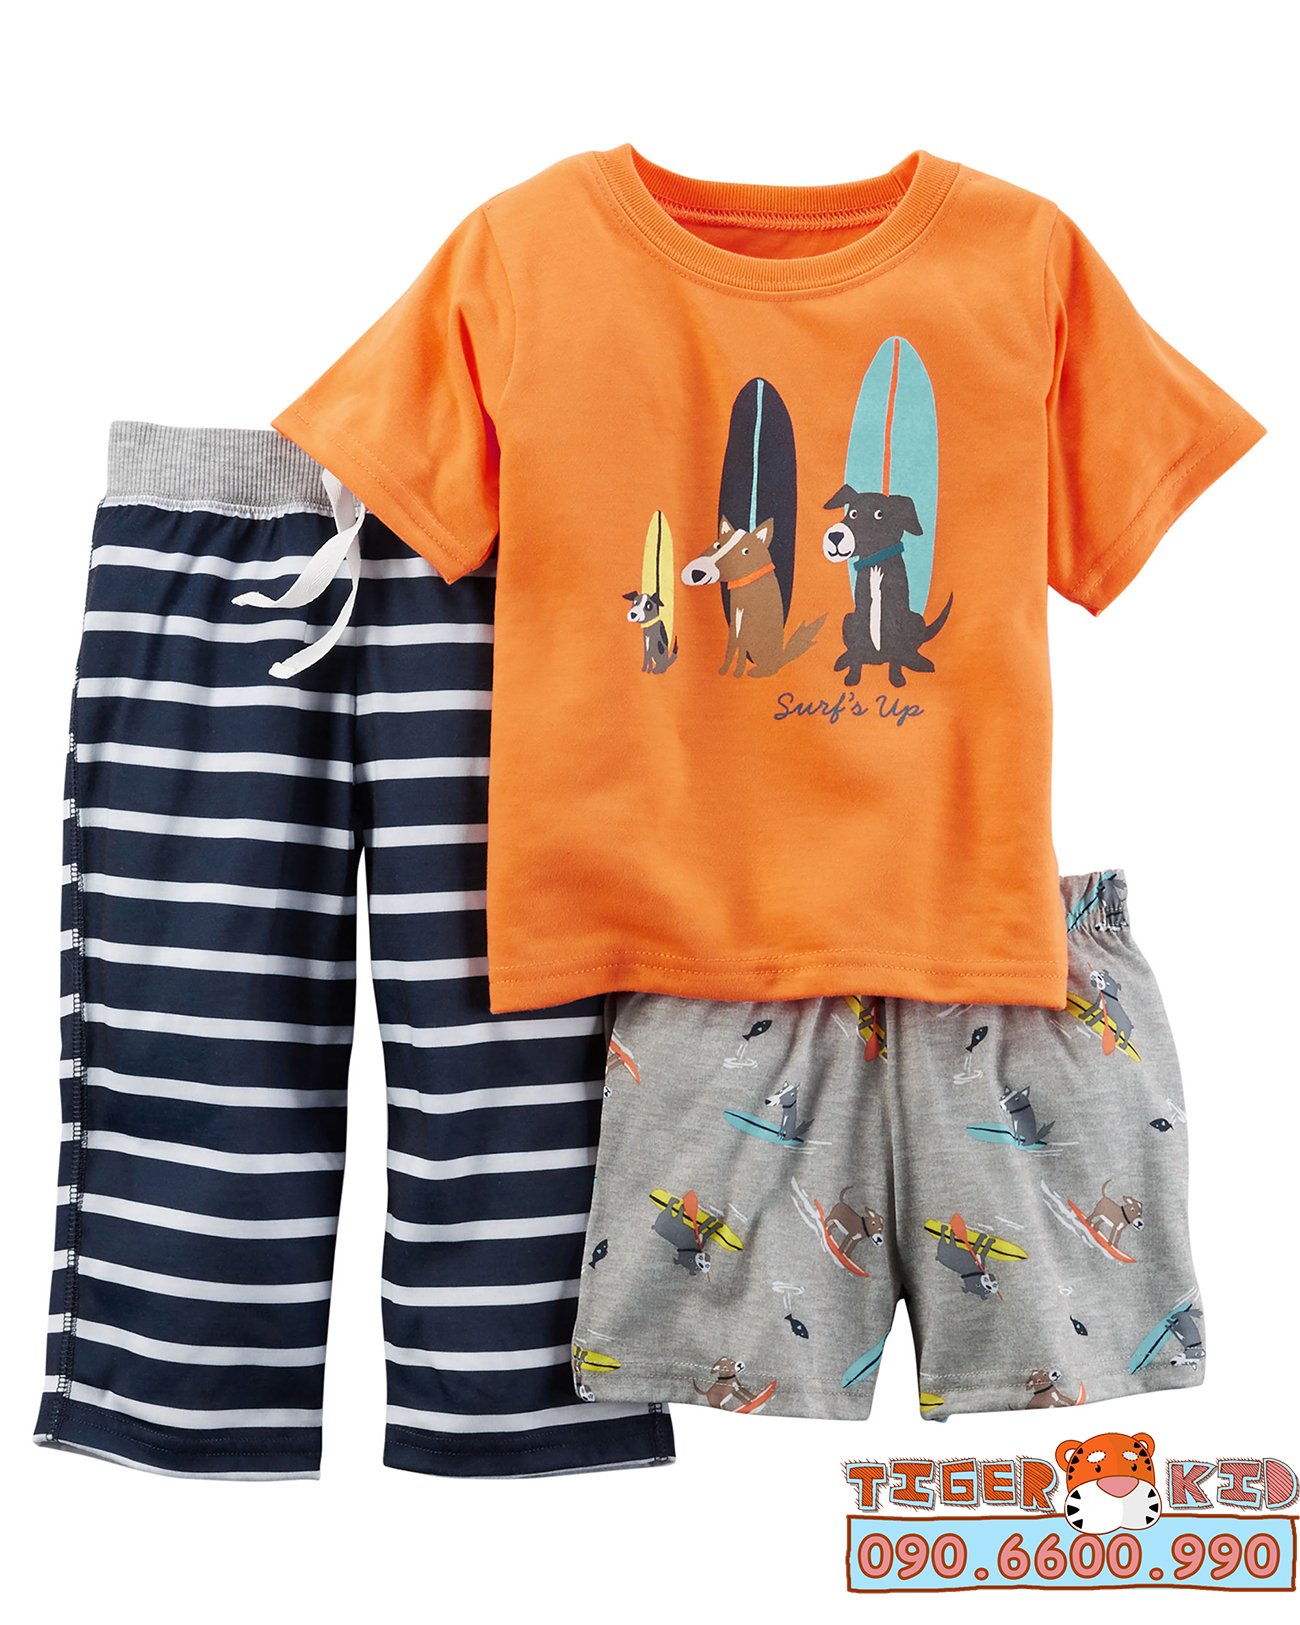 28262738496 28f6423dc4 o Bộ set Pijamas 12M 18M 24M